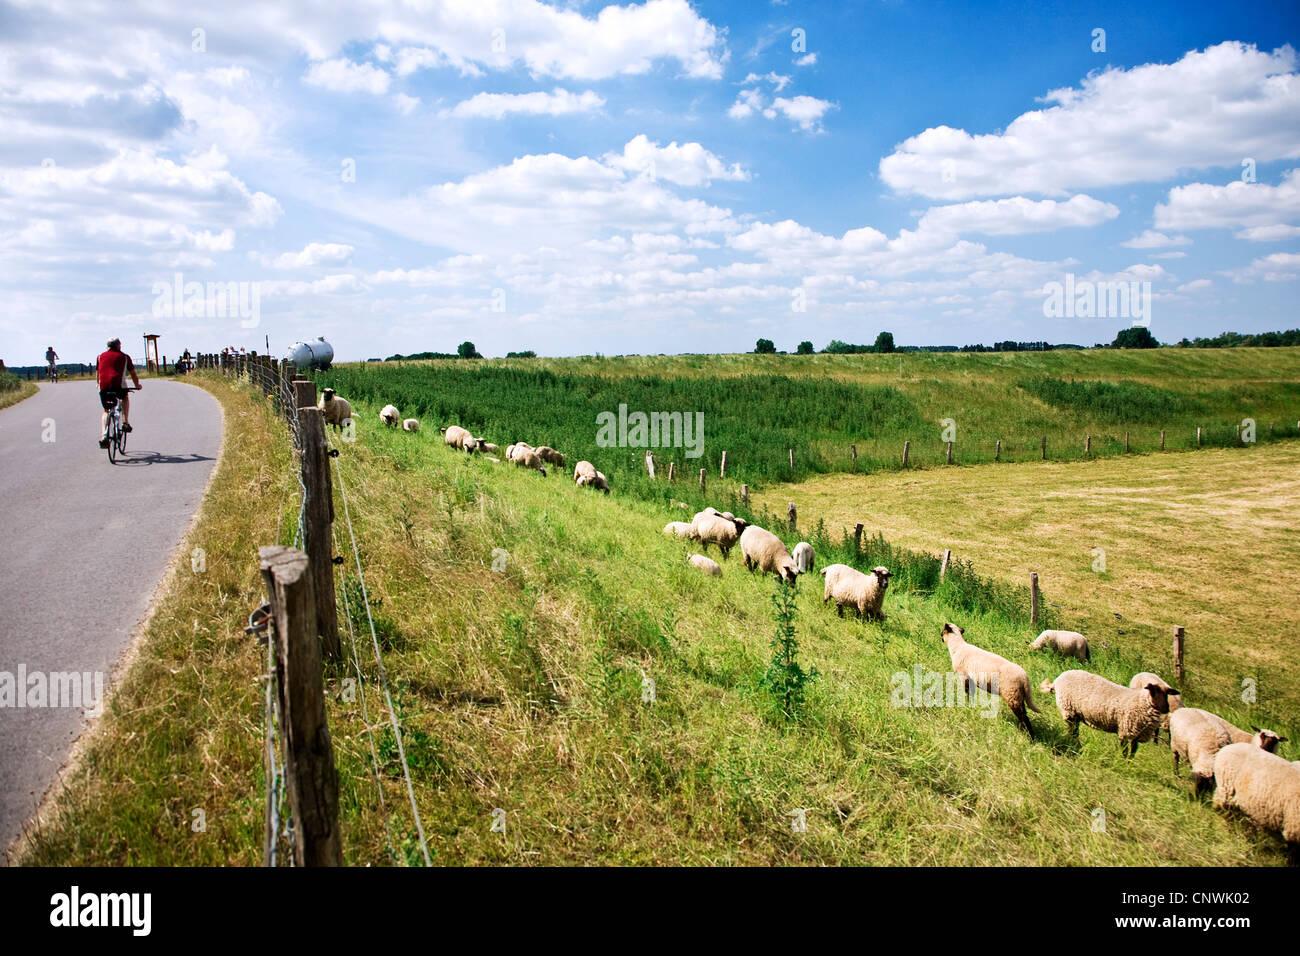 bikers on a dyke with grazing sheep at Bislicher Insel in Lower Rhine region, Niederrhein, Germany, North Rhine - Stock Image